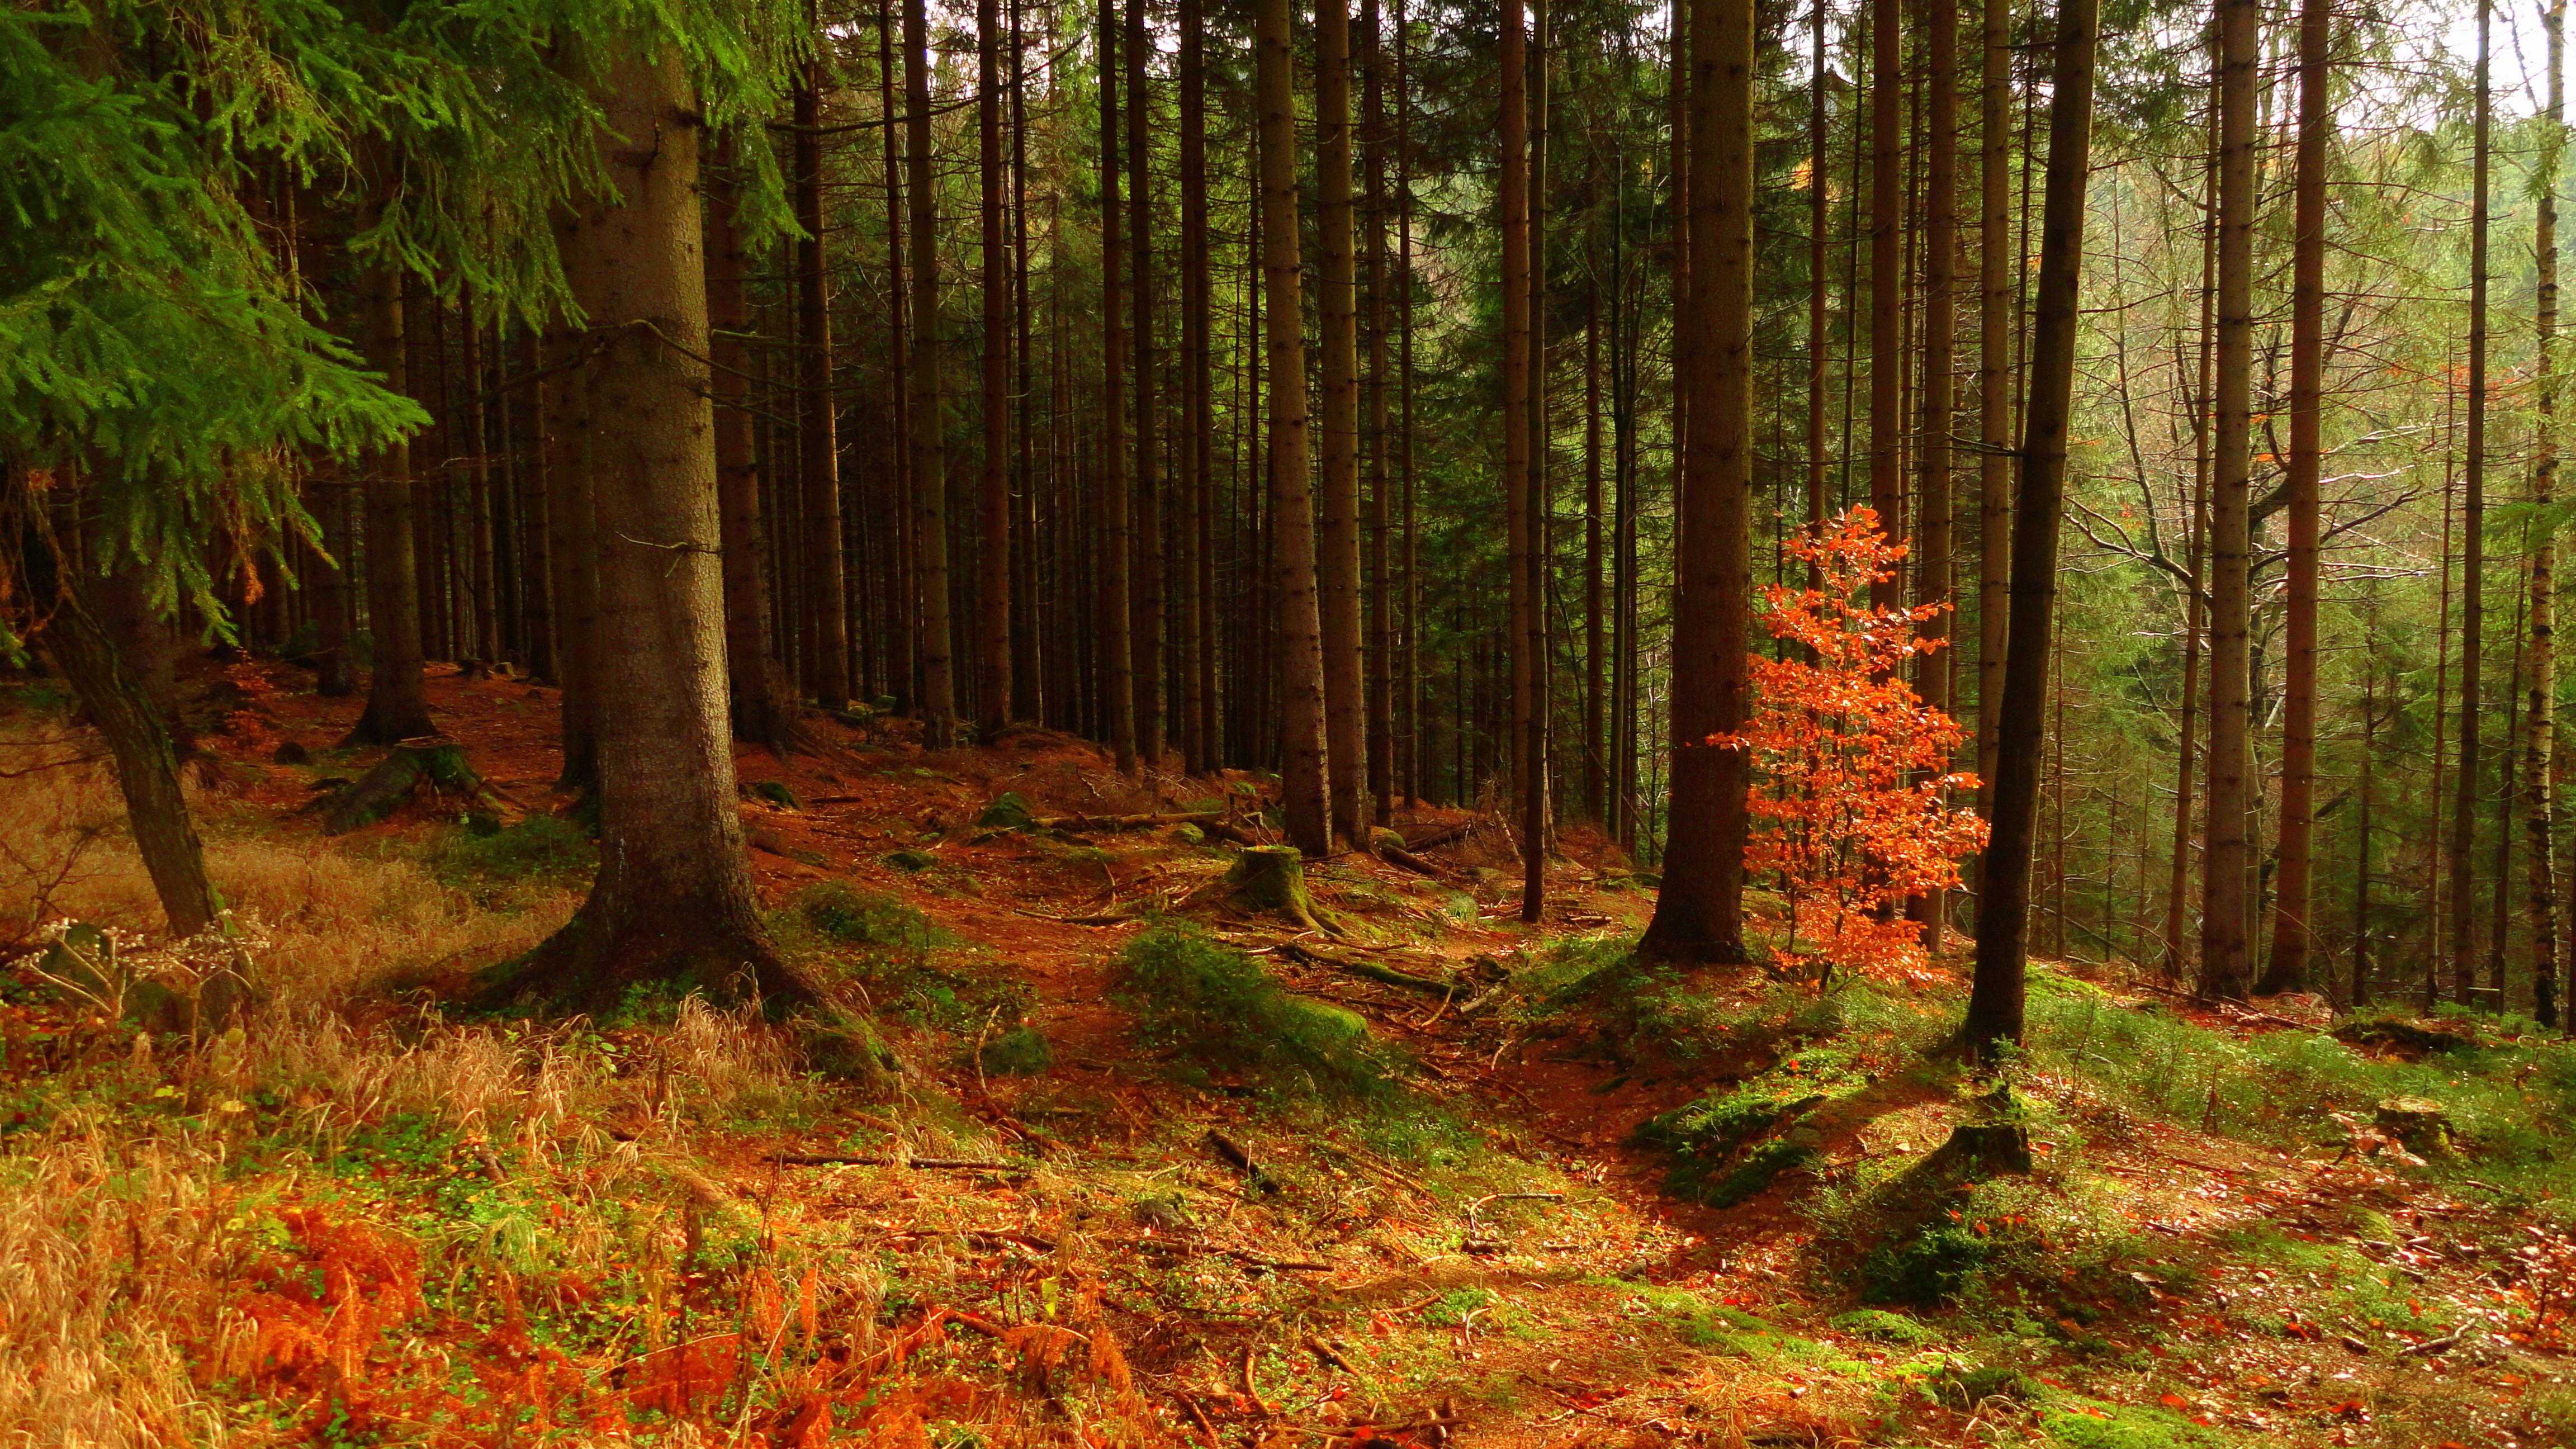 Значение леса в жизни человека картинки висмаре преобладает